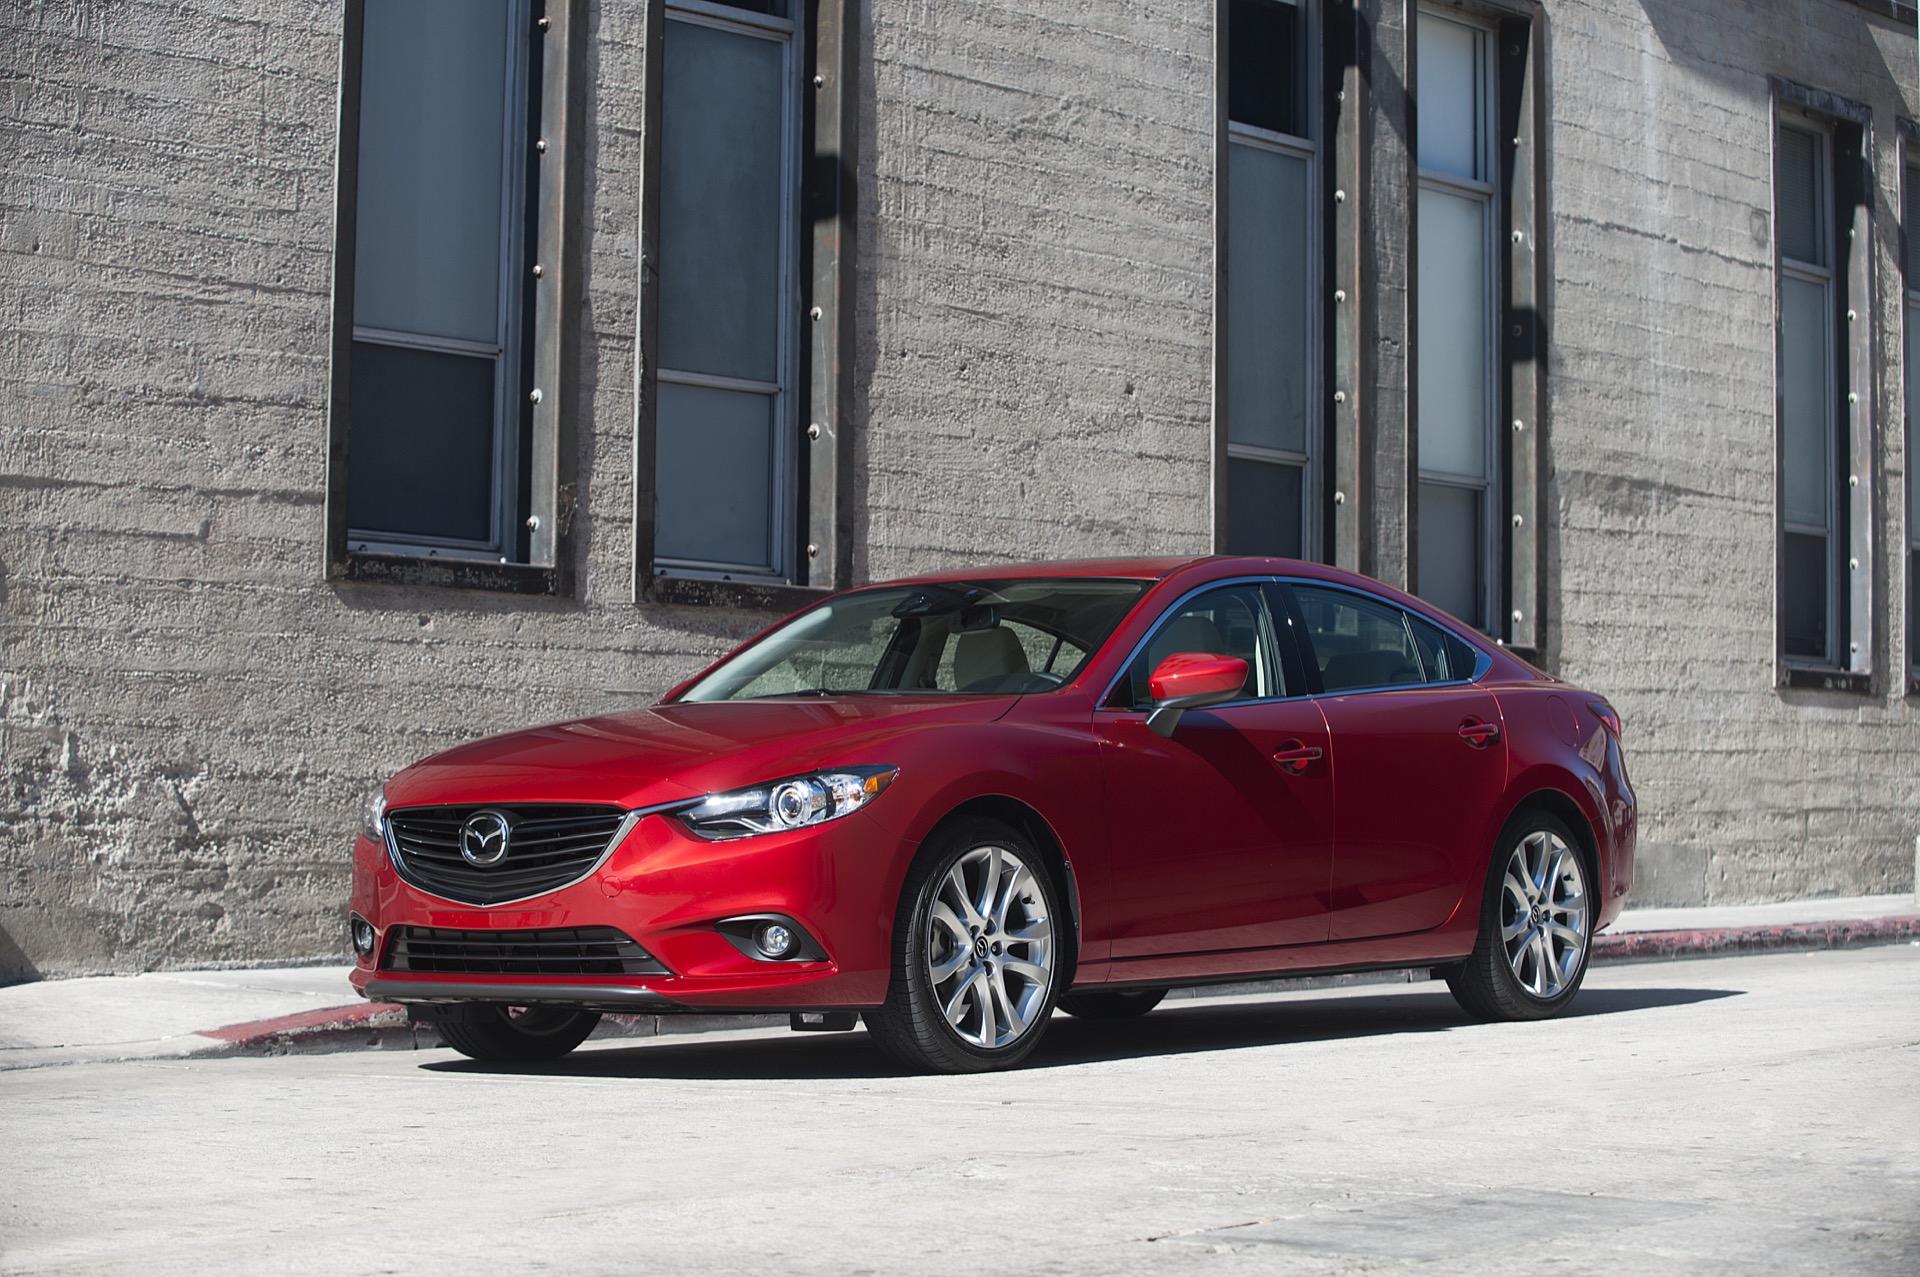 Kelebihan Kekurangan Mazda 6 2015 Review